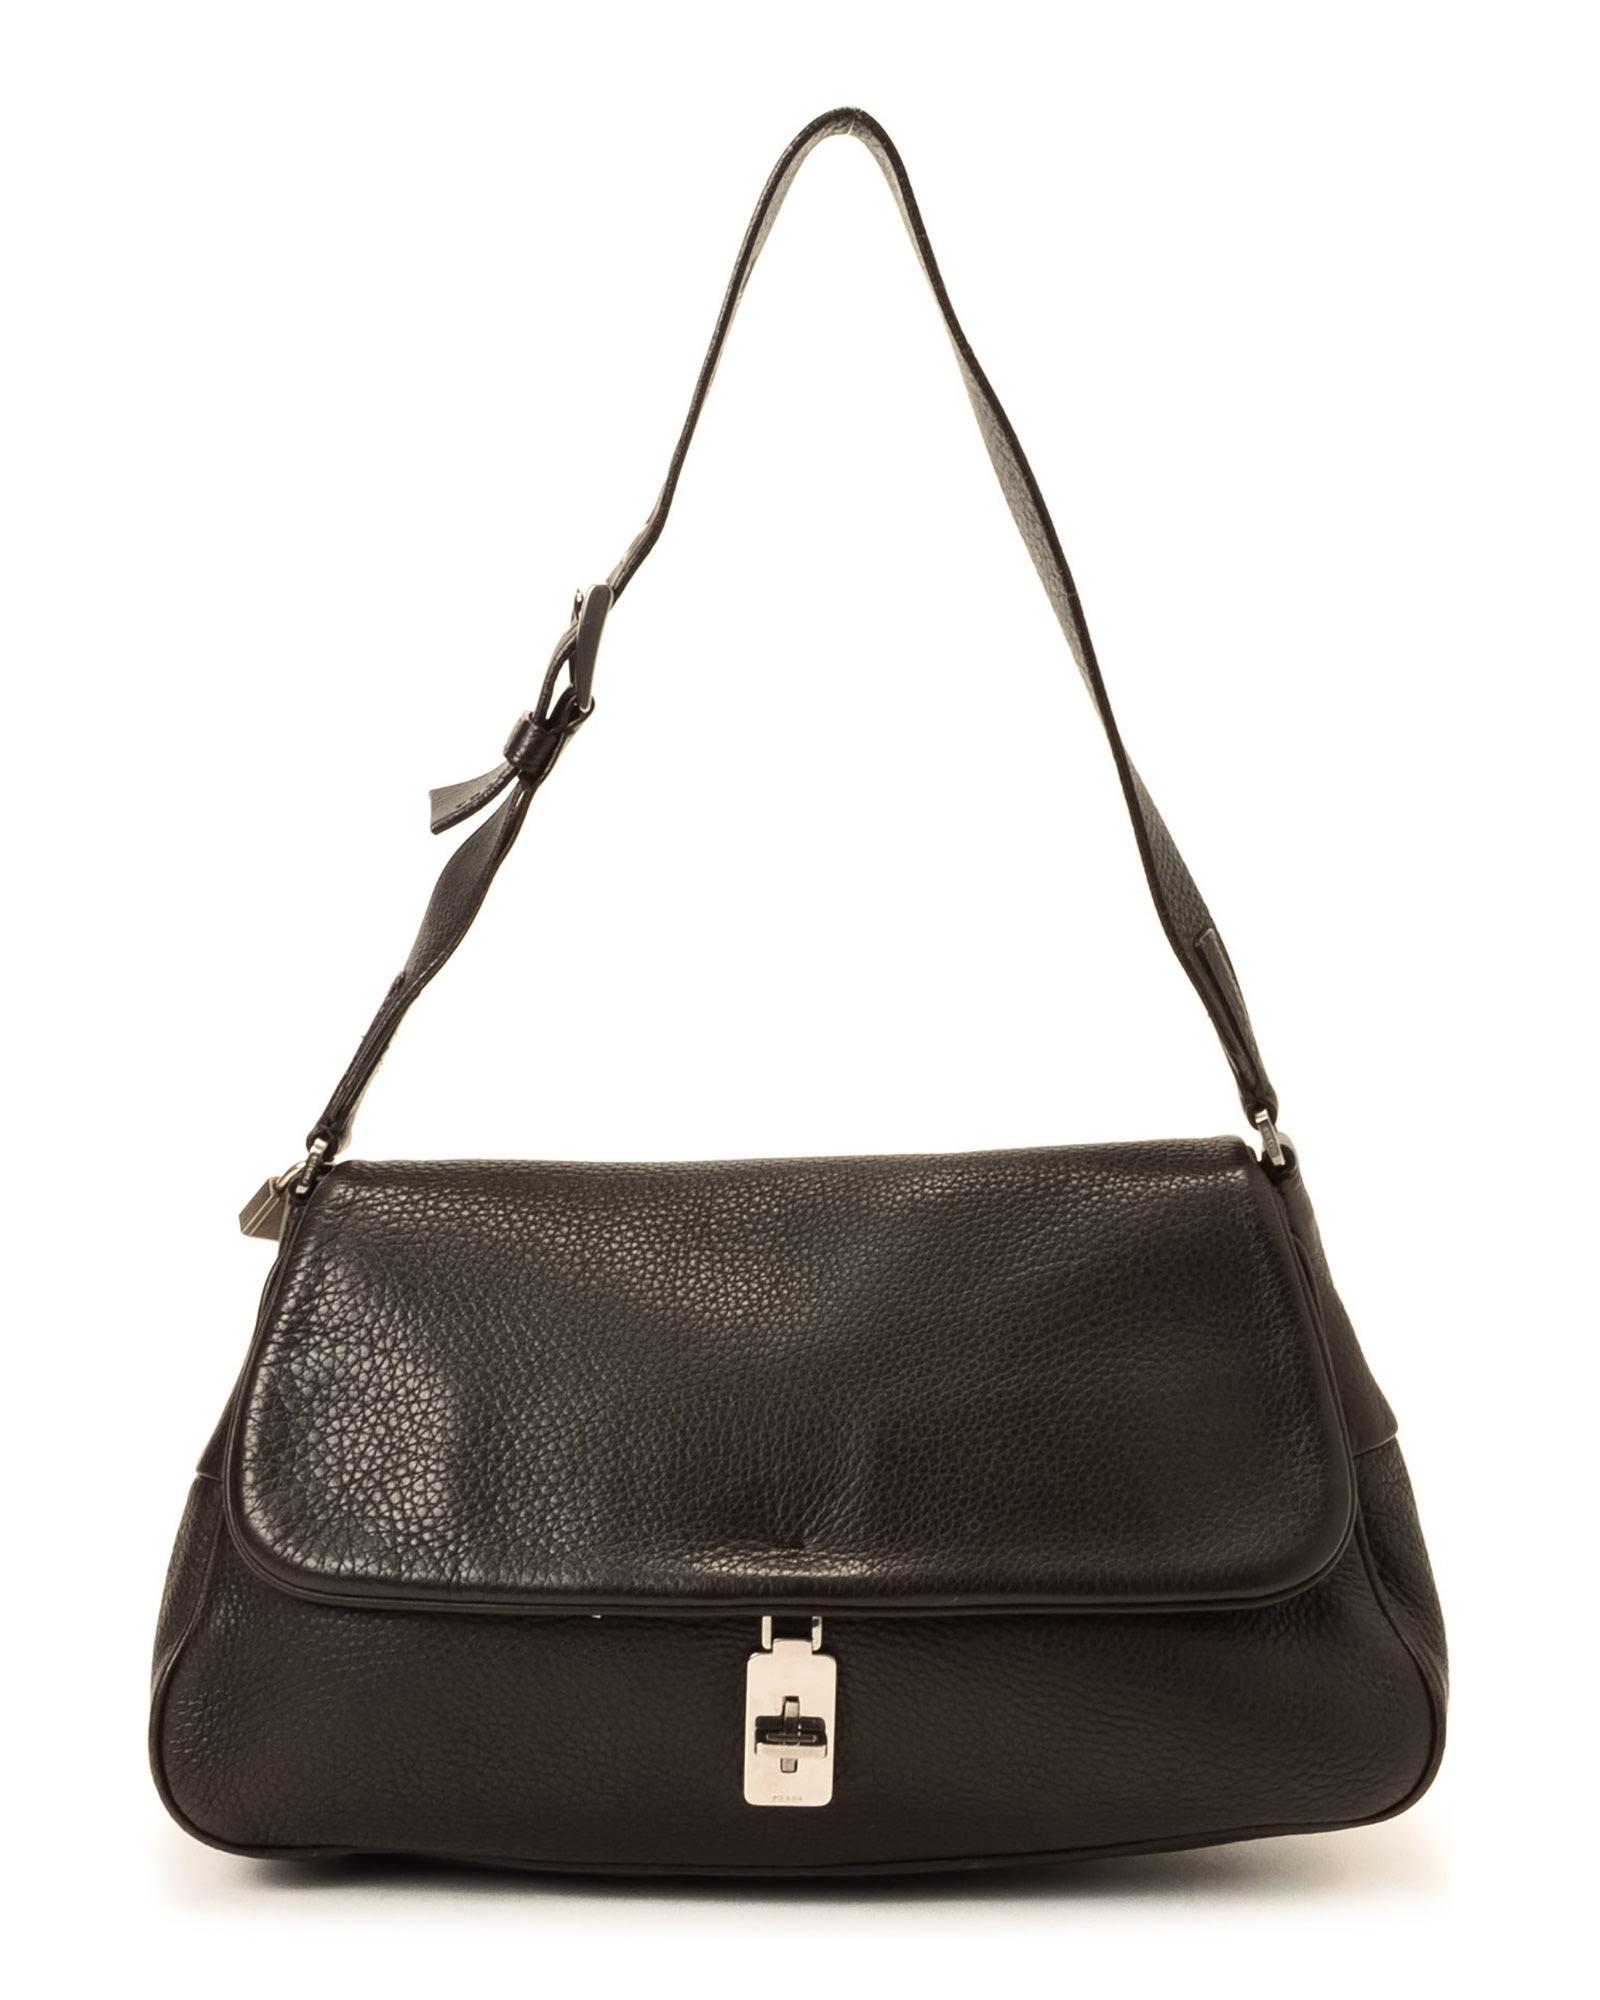 44fb7ffec5d2 cheap prada cahier shoulder bag black a2d3a 85126  clearance lyst prada  shoulder bag vintage in brown 4325e 60cfc